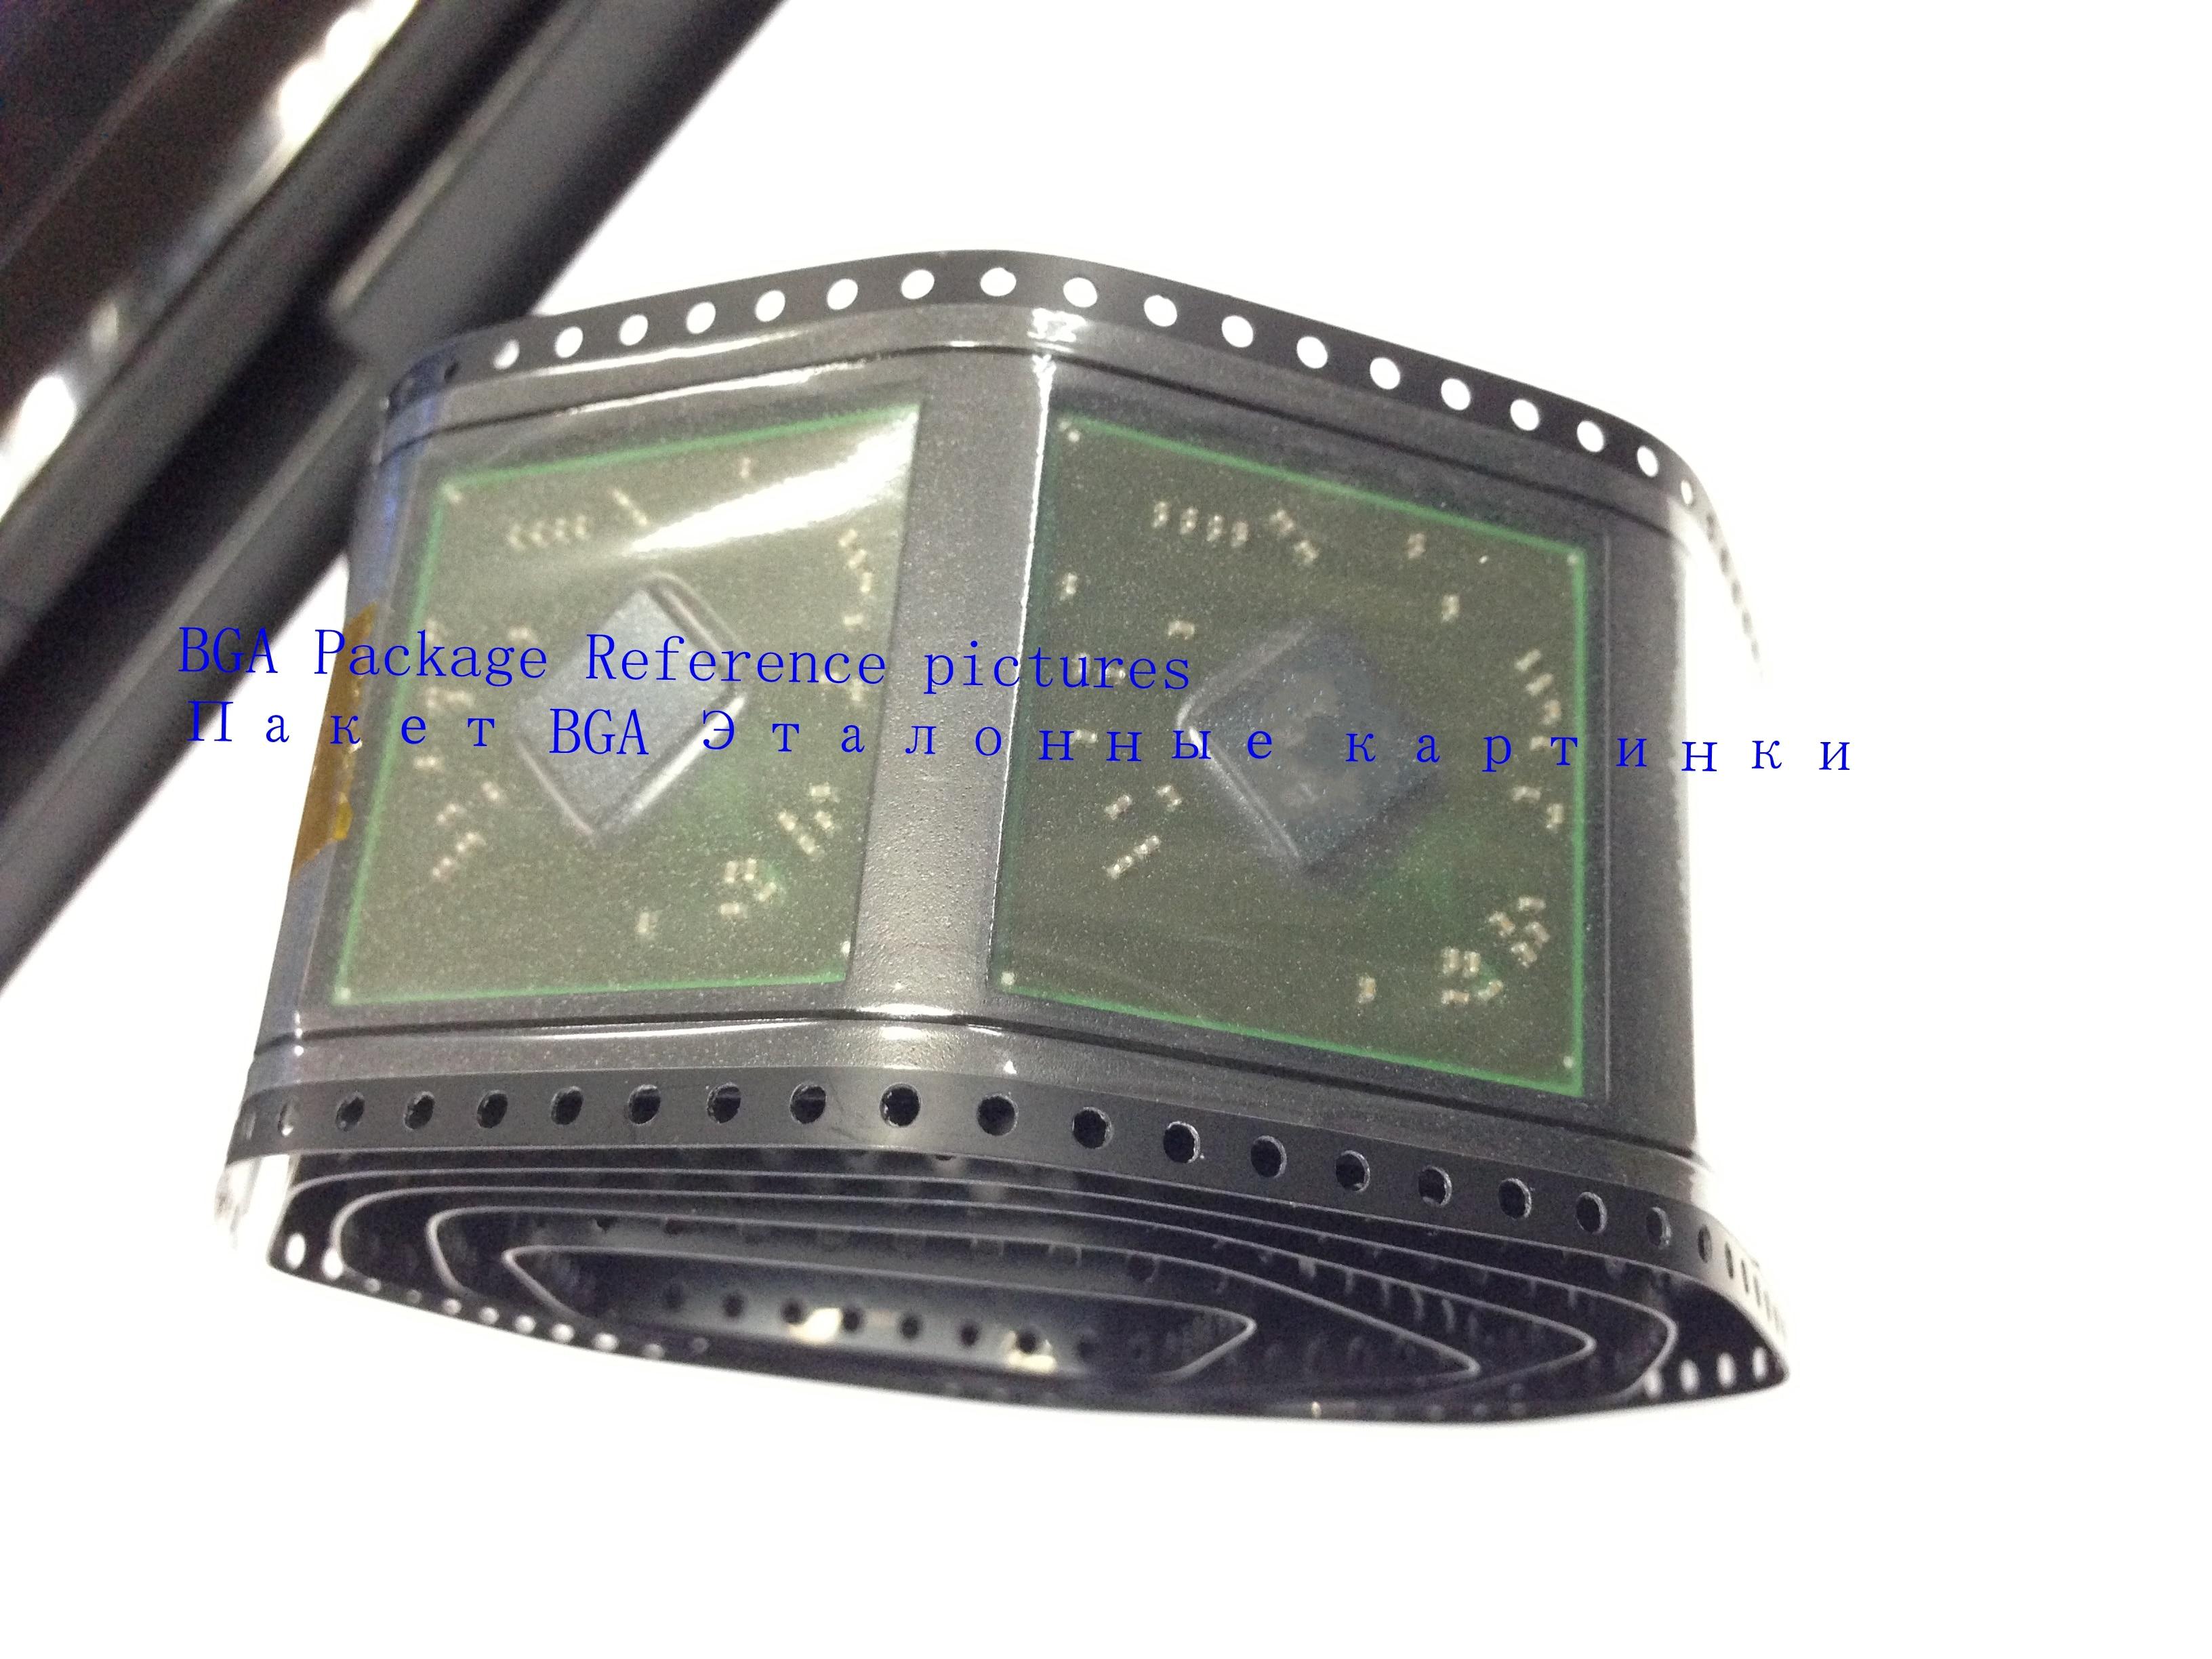 1pcs/lot 100% New N13E-GE-A2 N13E GE A2 BGA Chipset1pcs/lot 100% New N13E-GE-A2 N13E GE A2 BGA Chipset